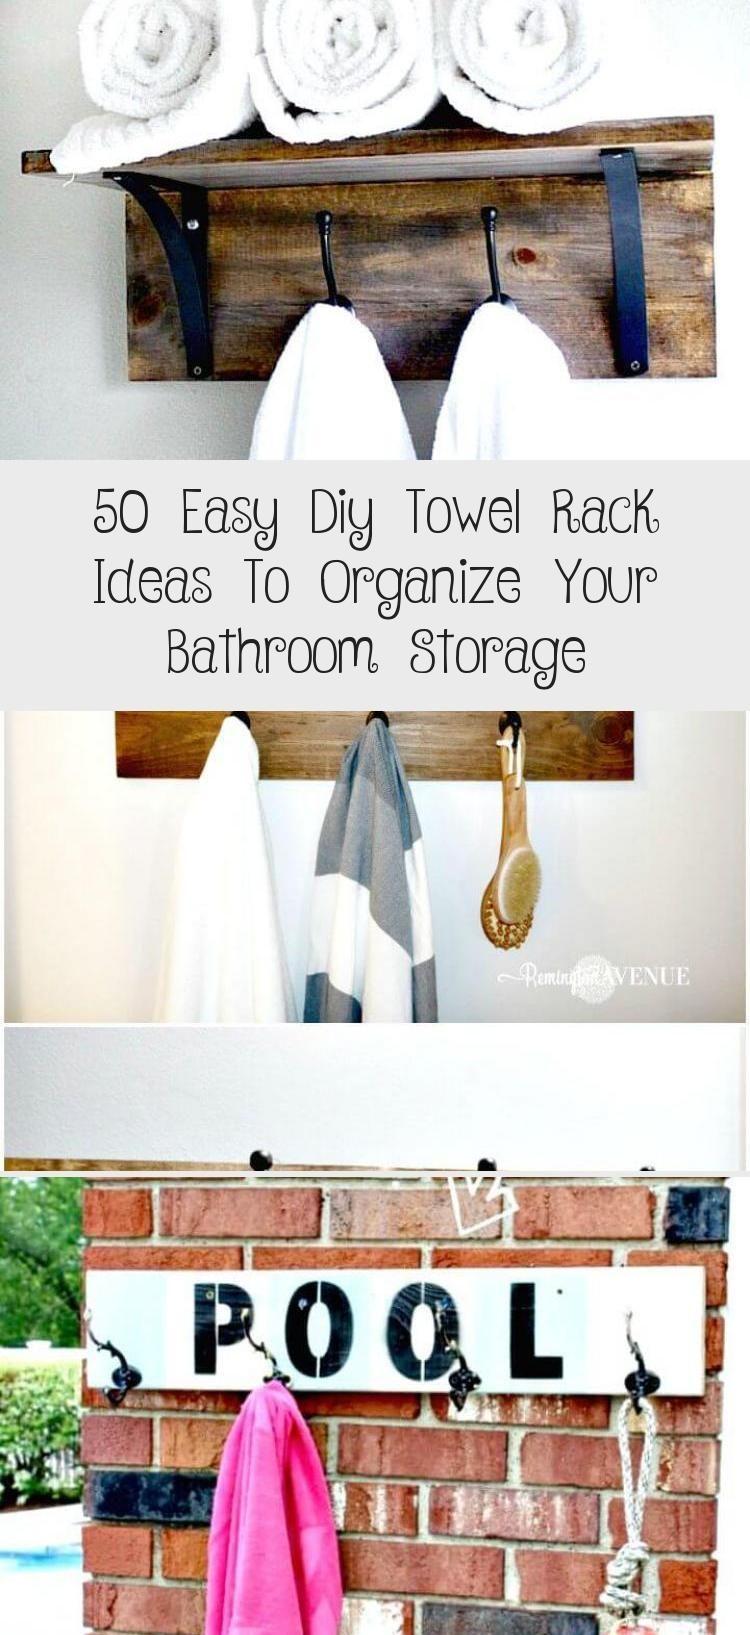 50 Easy Diy Towel Rack Ideas To Organize Your Bathroom